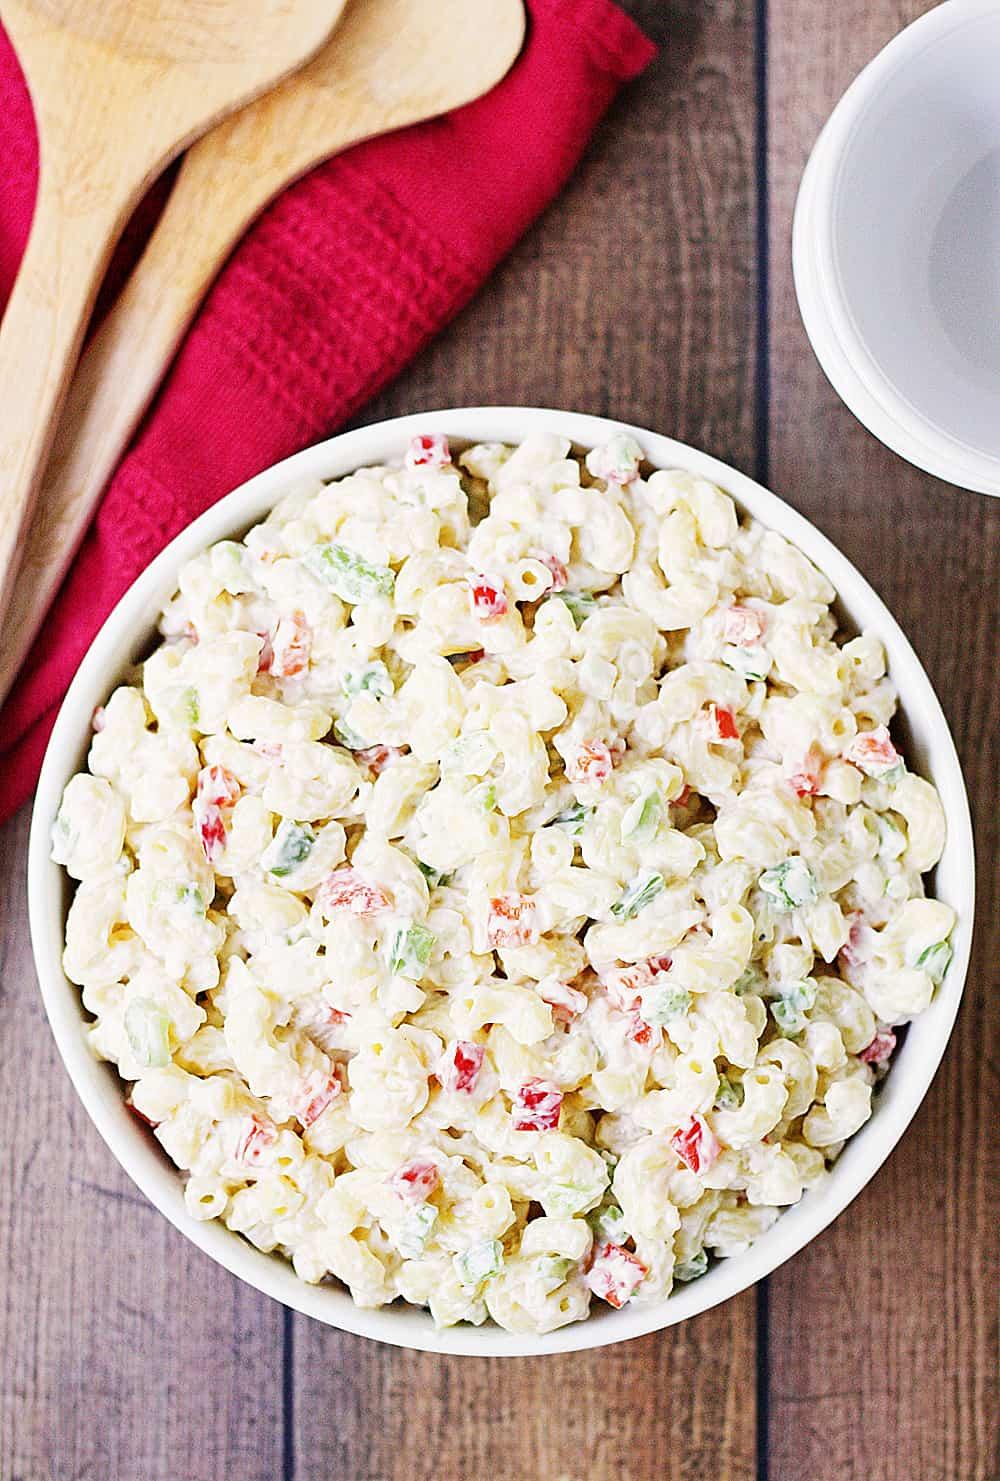 Best Ever Macaroni Salad top view.